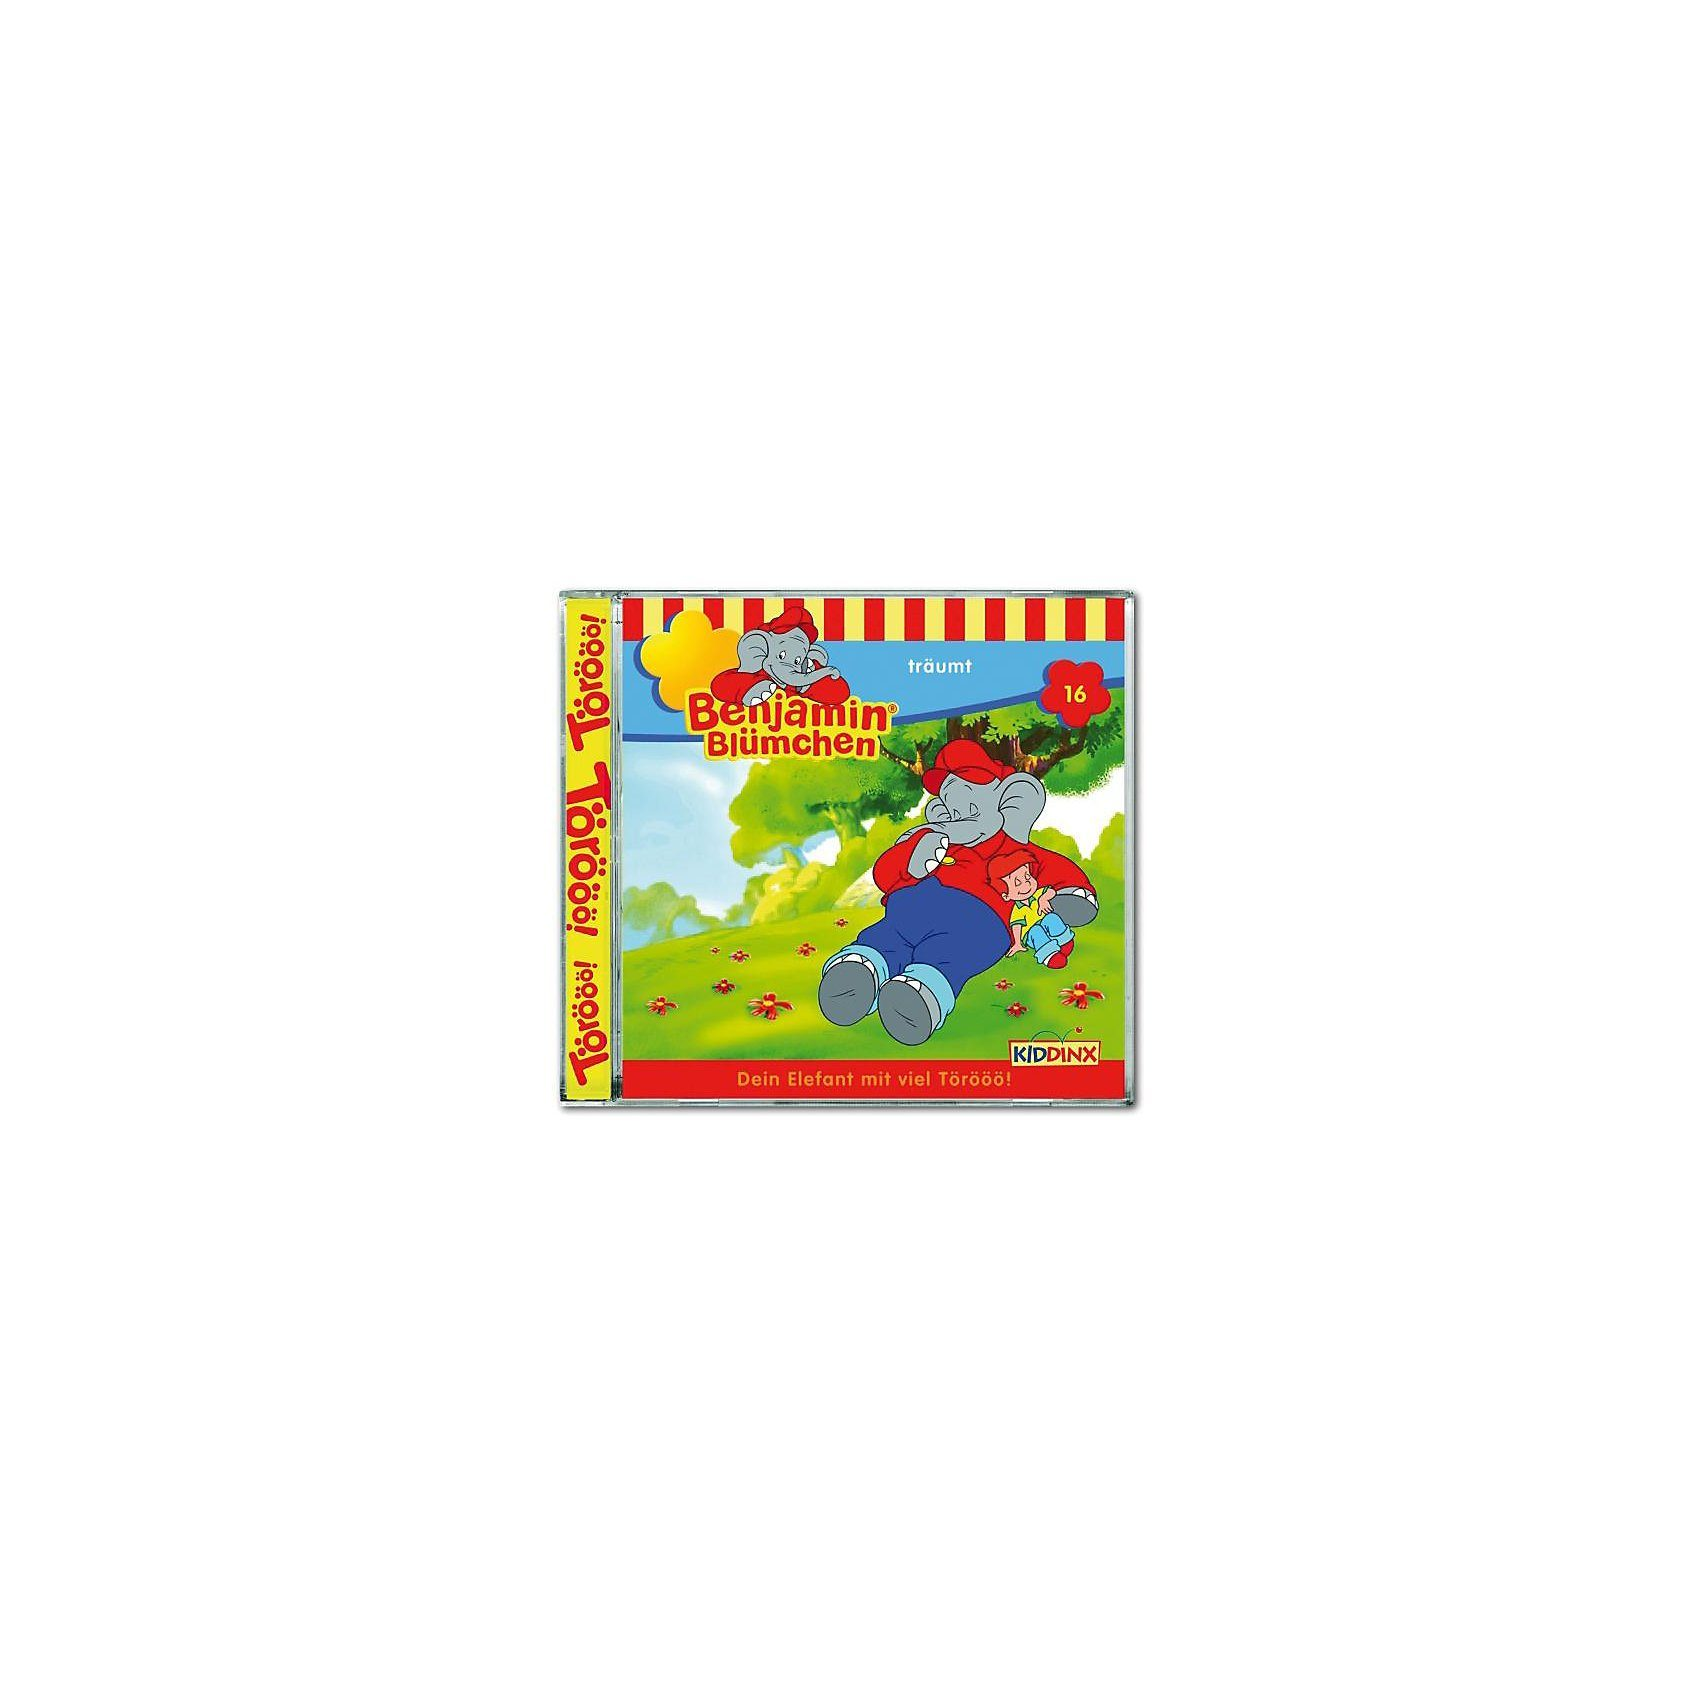 Kiddinx CD Benjamin Blümchen 16 - träumt